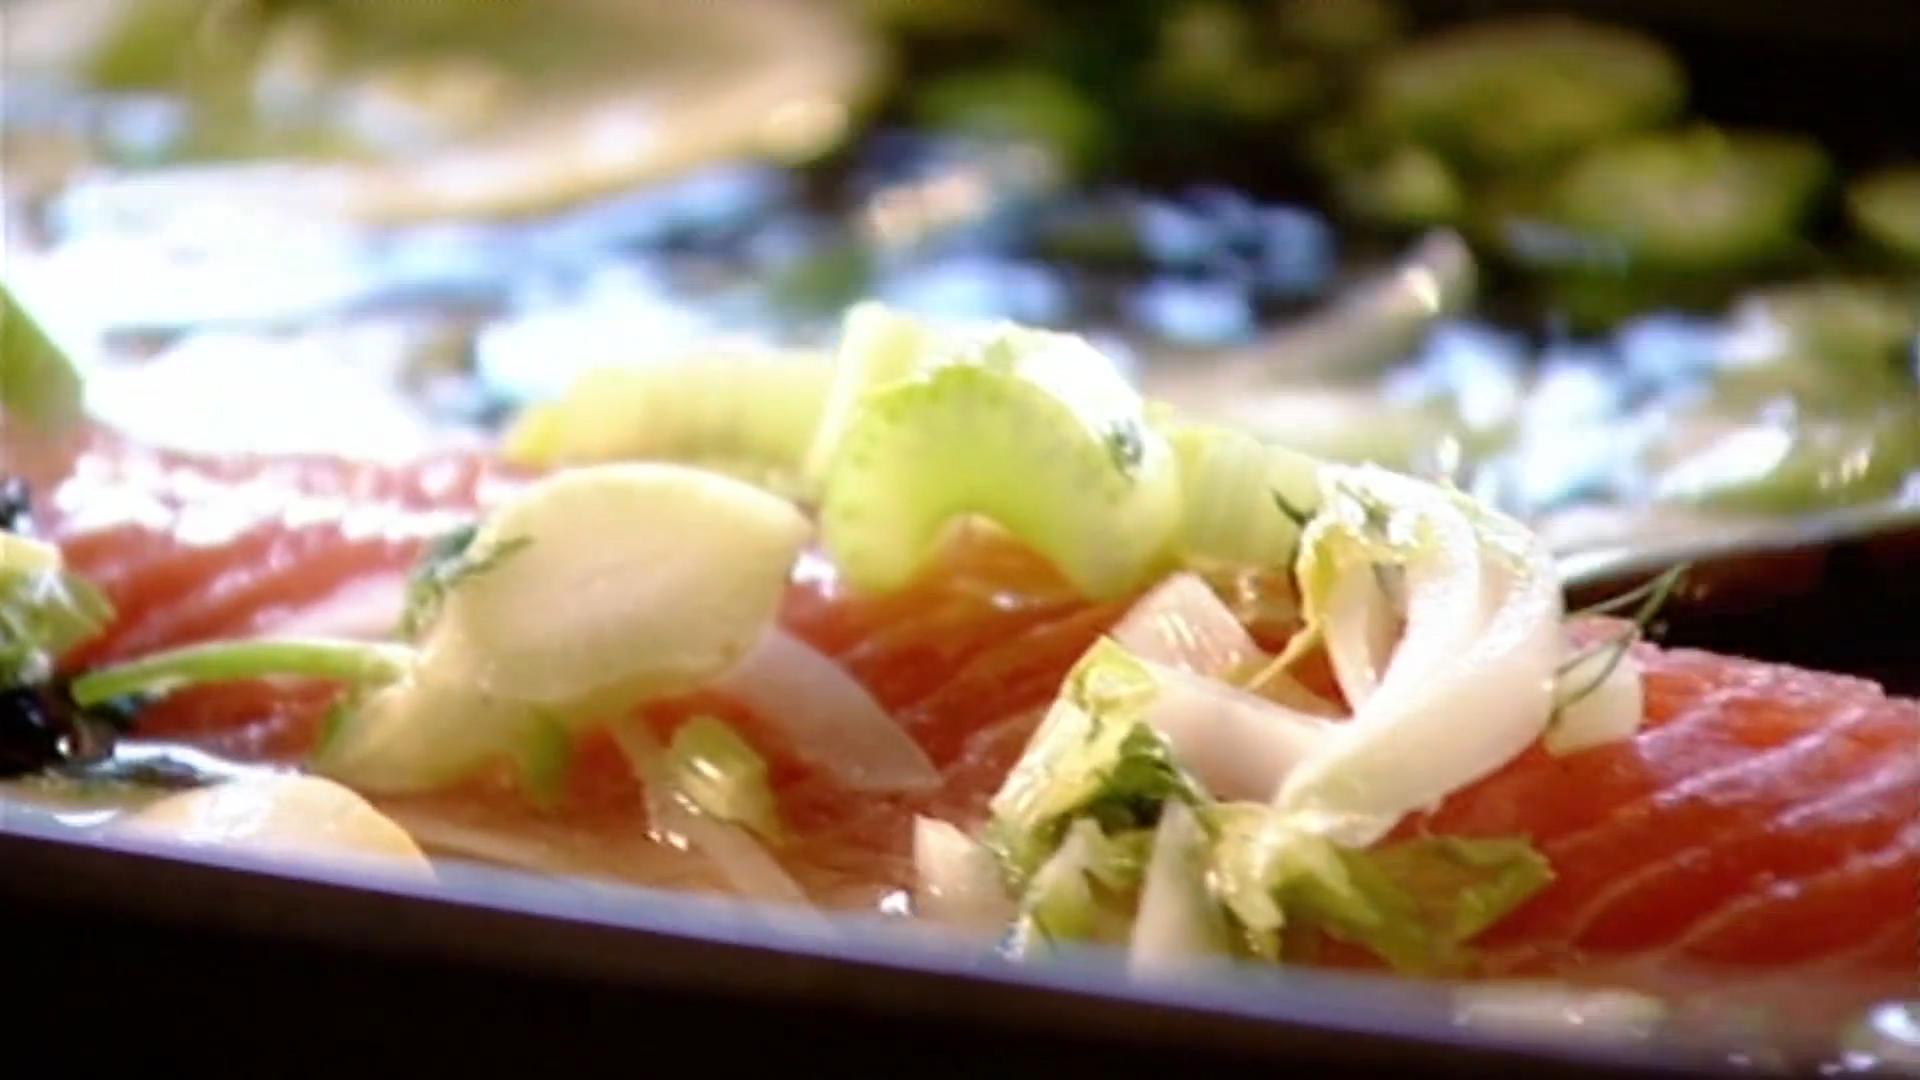 The Perfect Poached Salmon Recipe - Gordon Ramsay